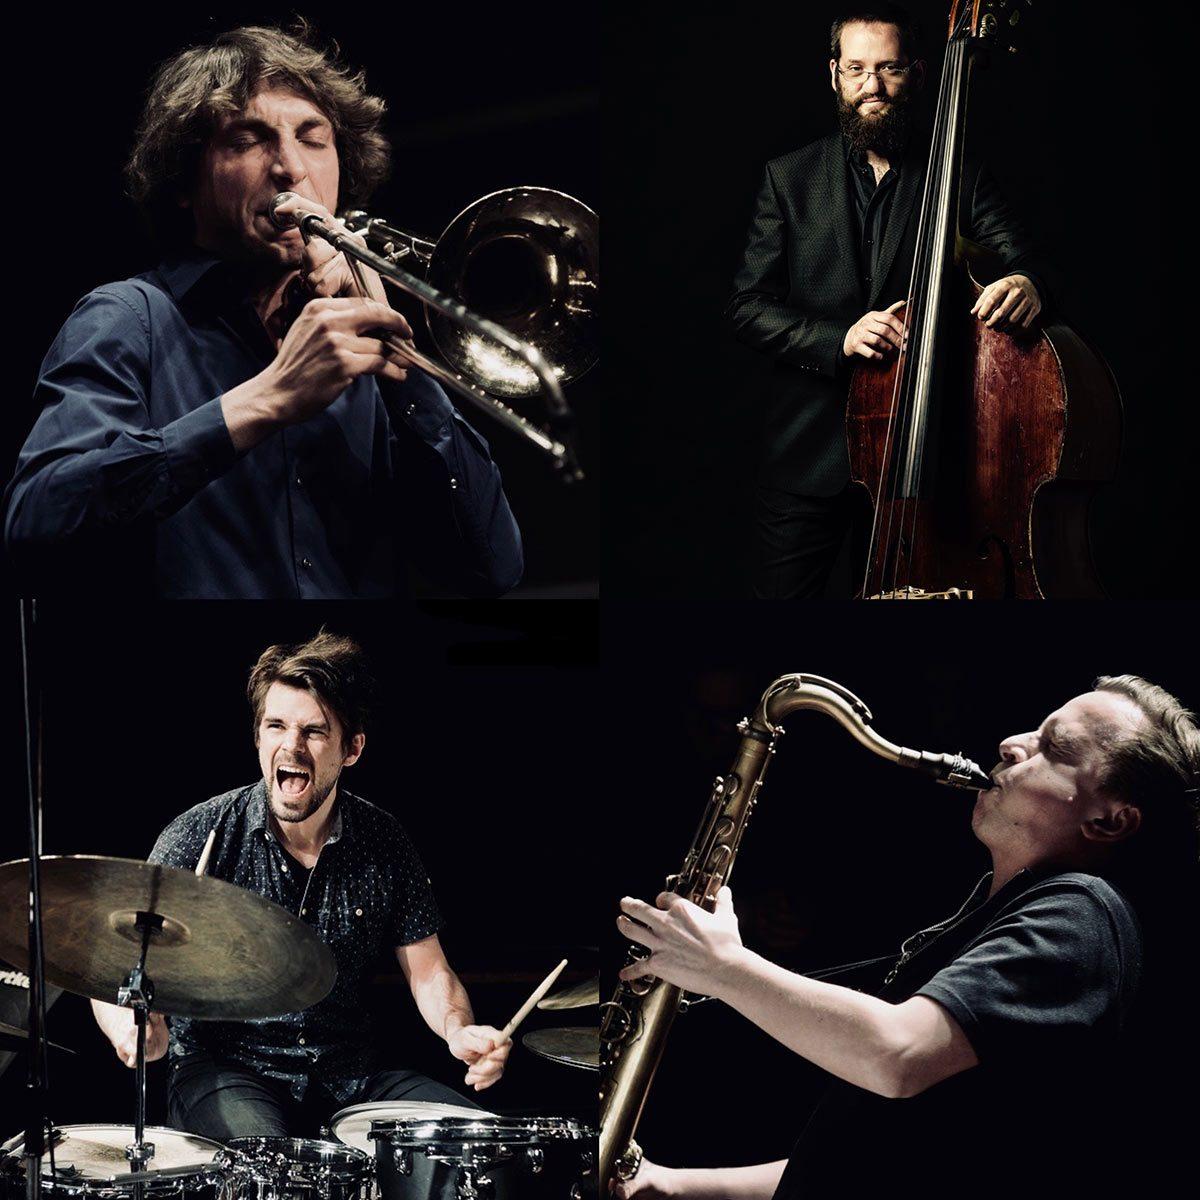 Sebastian Gille, Johannes Lauer, Robert Landfermann, Jonas Burgwinkel